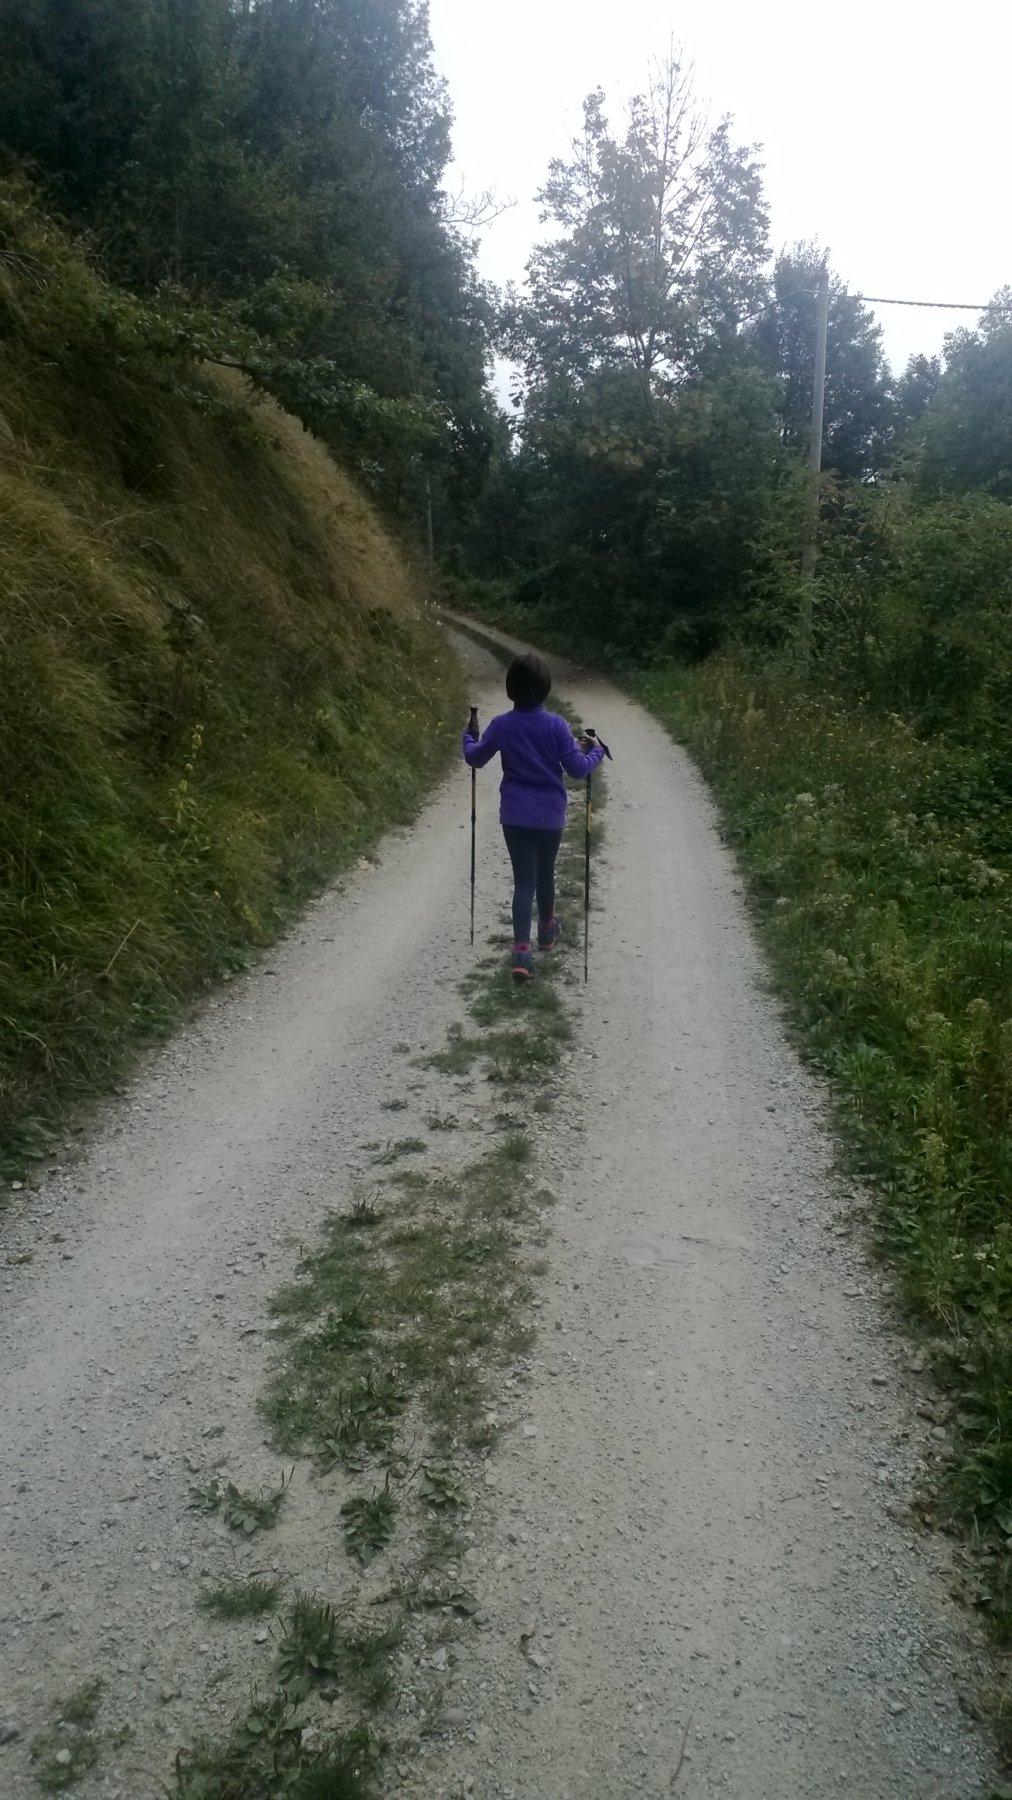 Maga in cammino